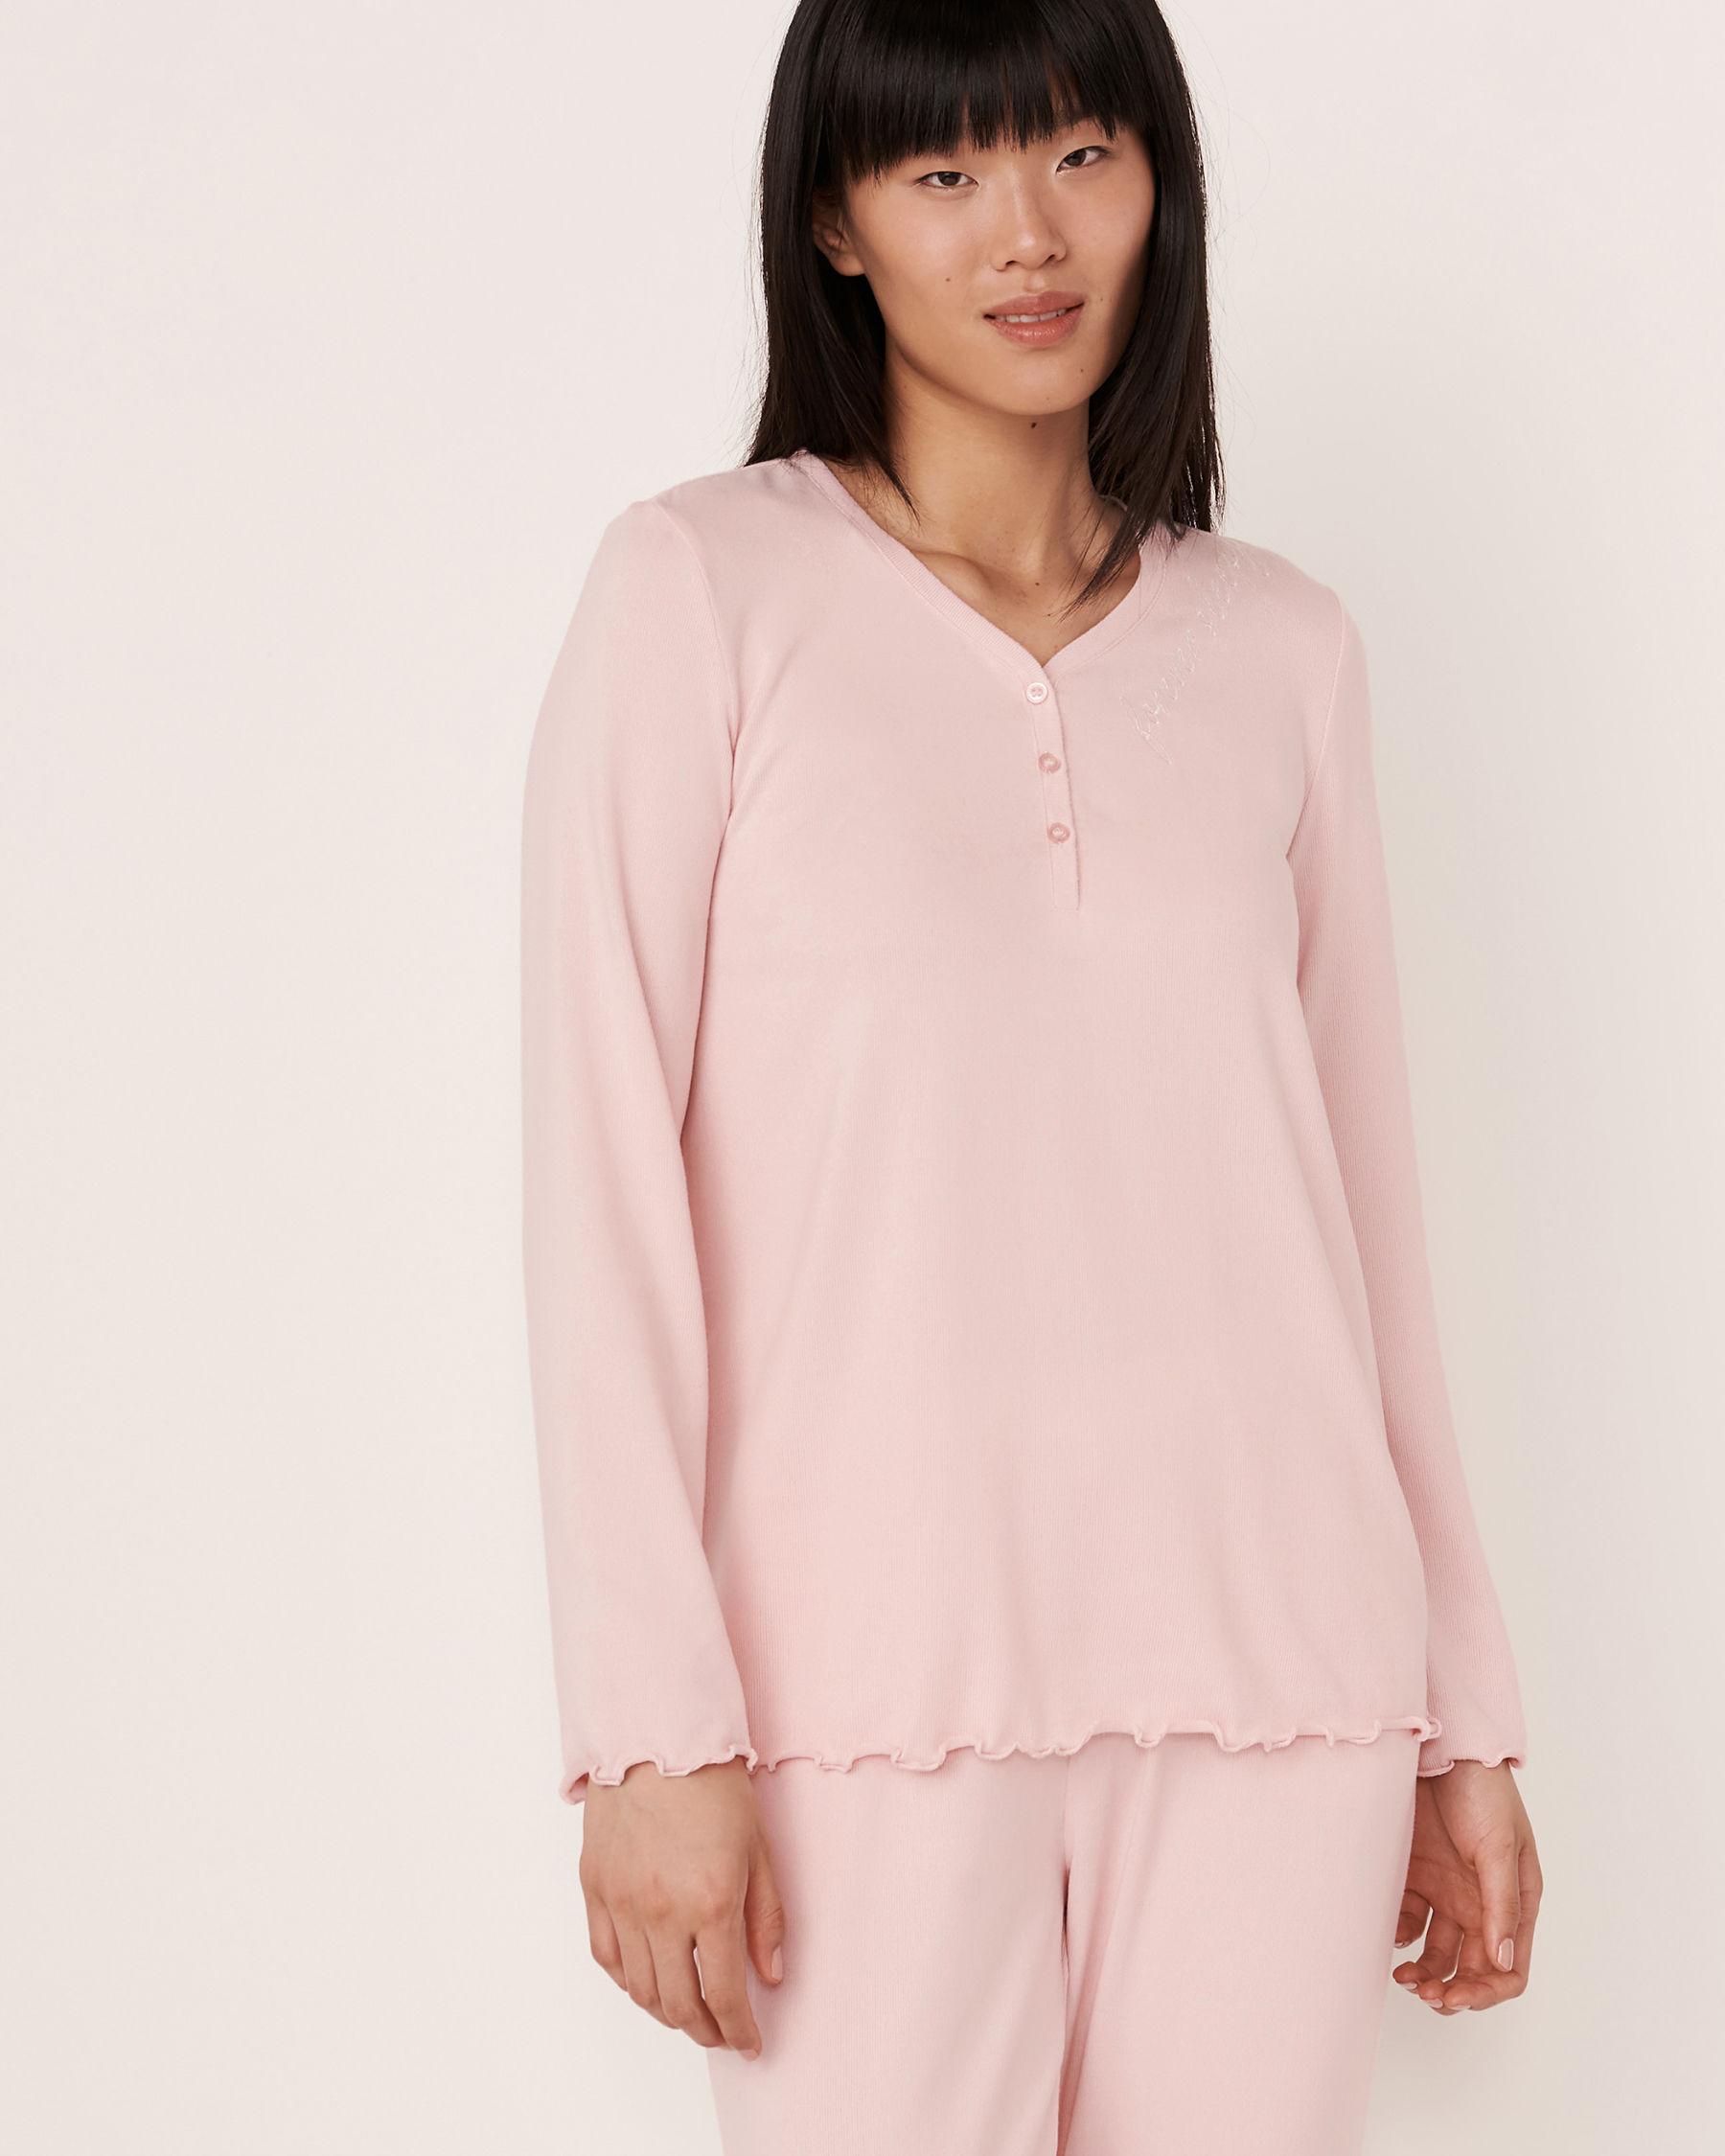 LA VIE EN ROSE Recycled Fibers Henley Long Sleeve Shirt Light pink 40100091 - View1